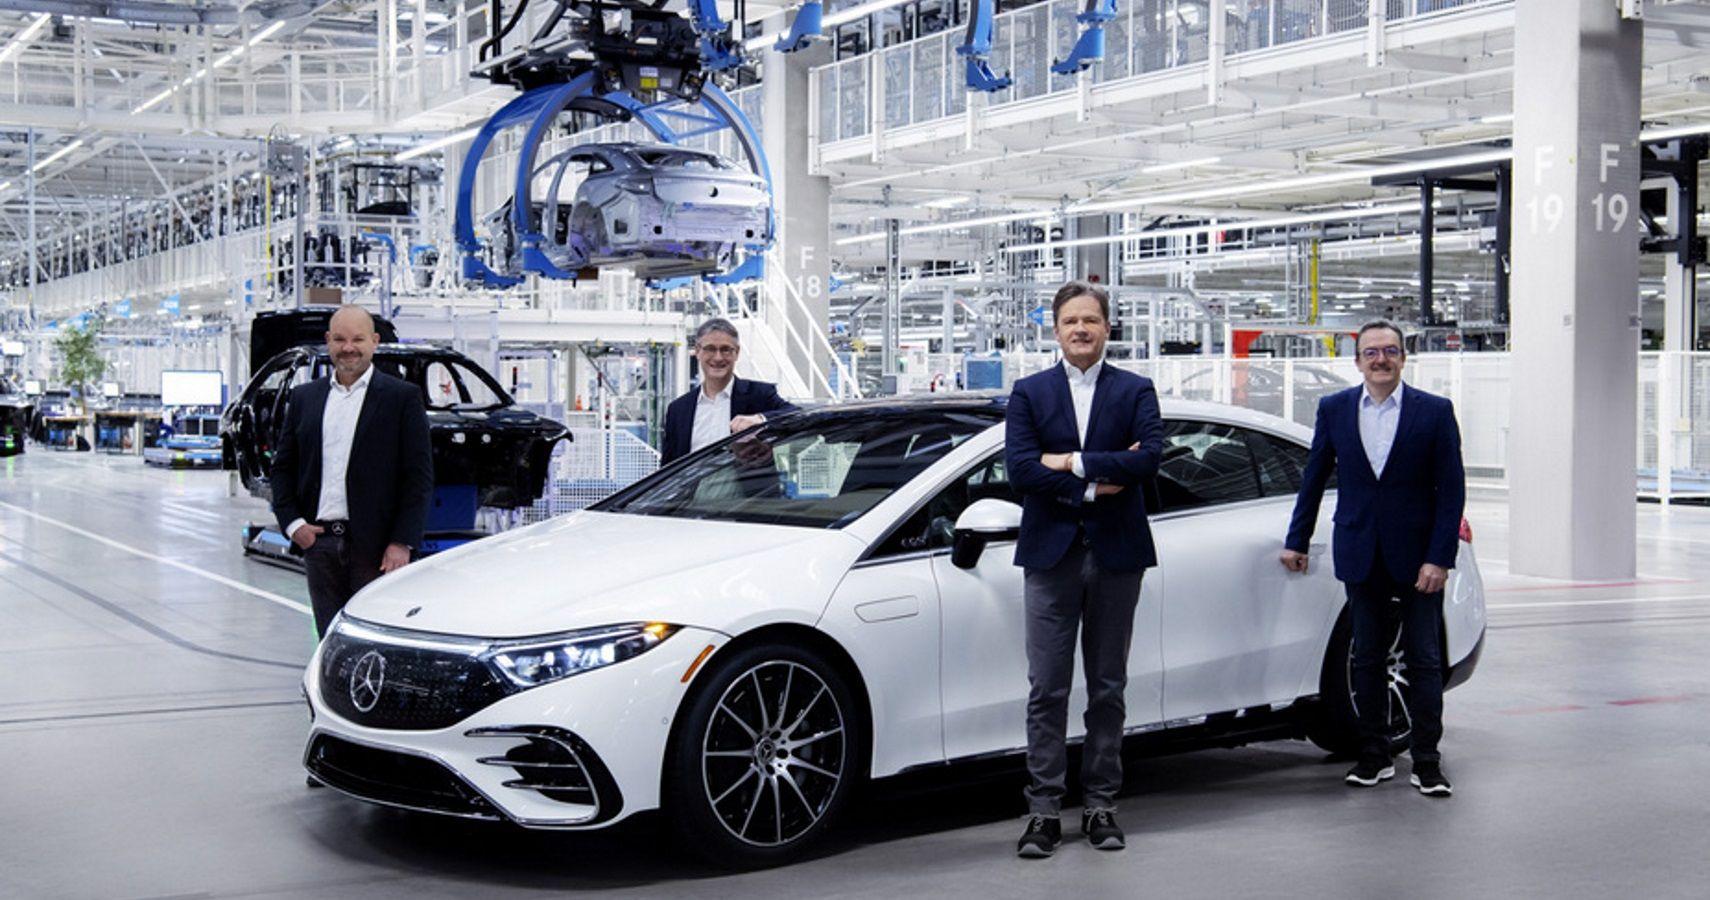 First Mercedes-Benz Electric Sedan Rolls Out From High-Tech Factory